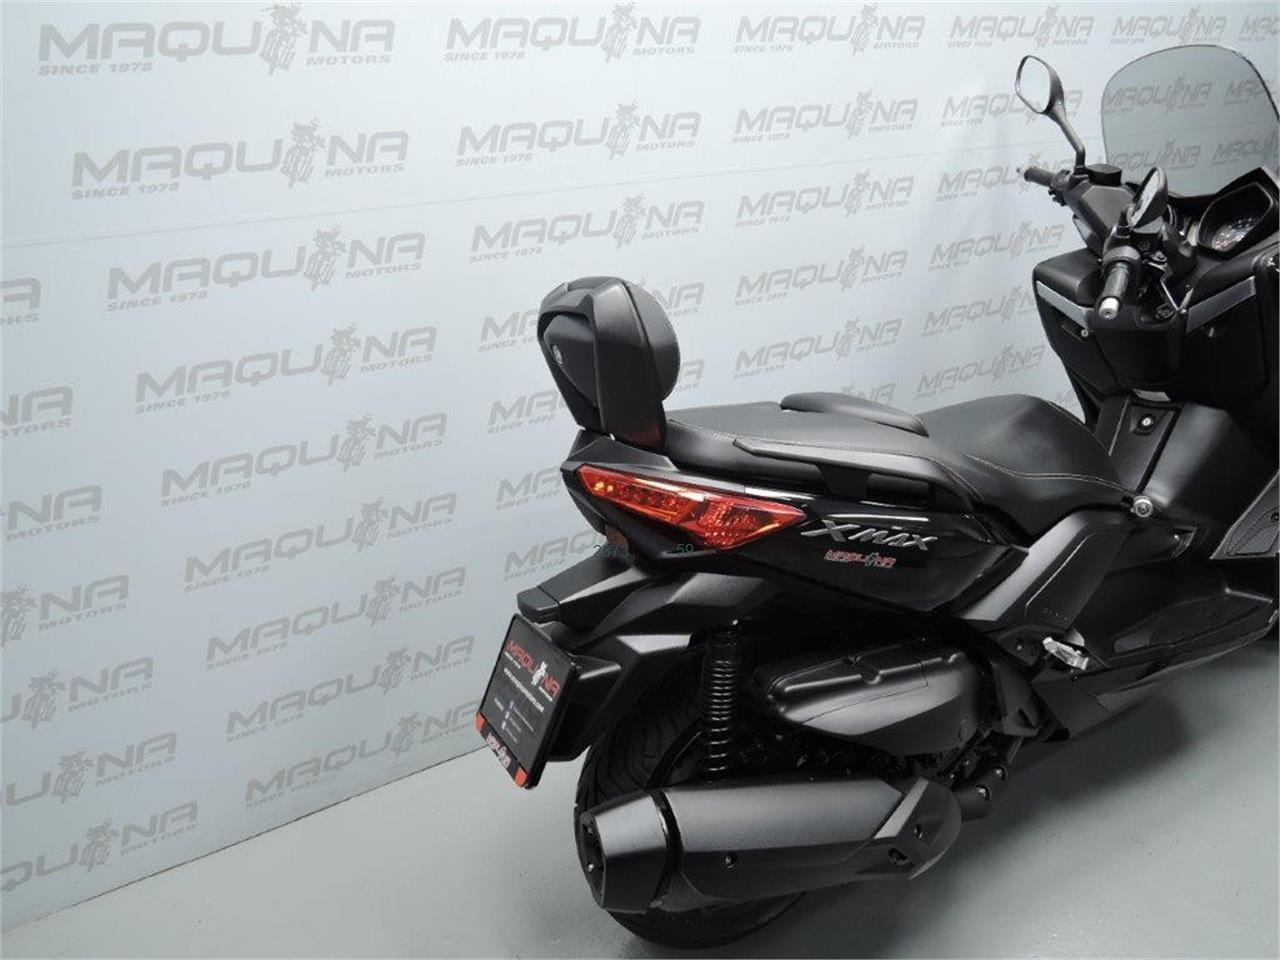 YAMAHA X MAX 400_2 de venta en Barcelona